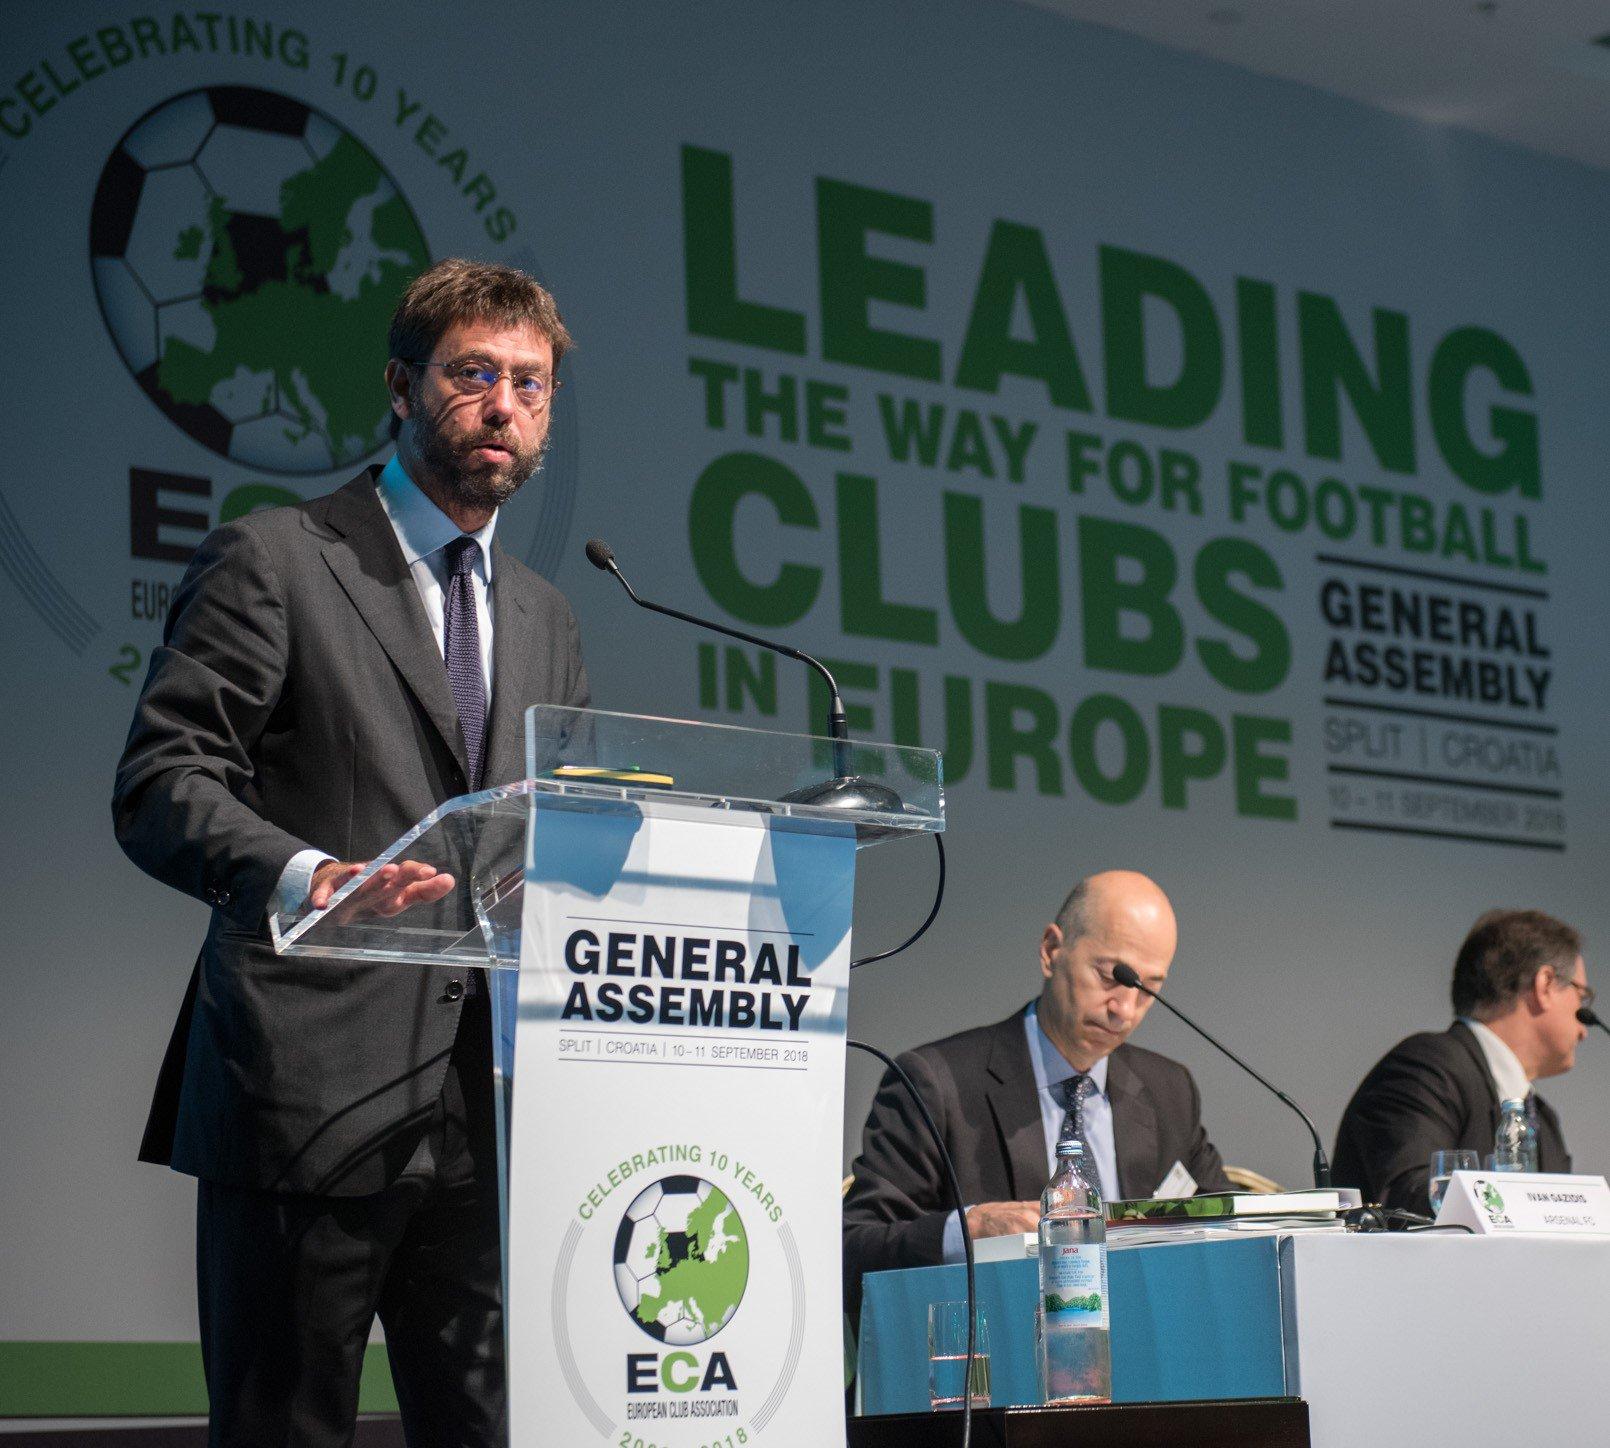 Presiden Asosiasi Klub Eropa (ECA), Andrea Agnelli